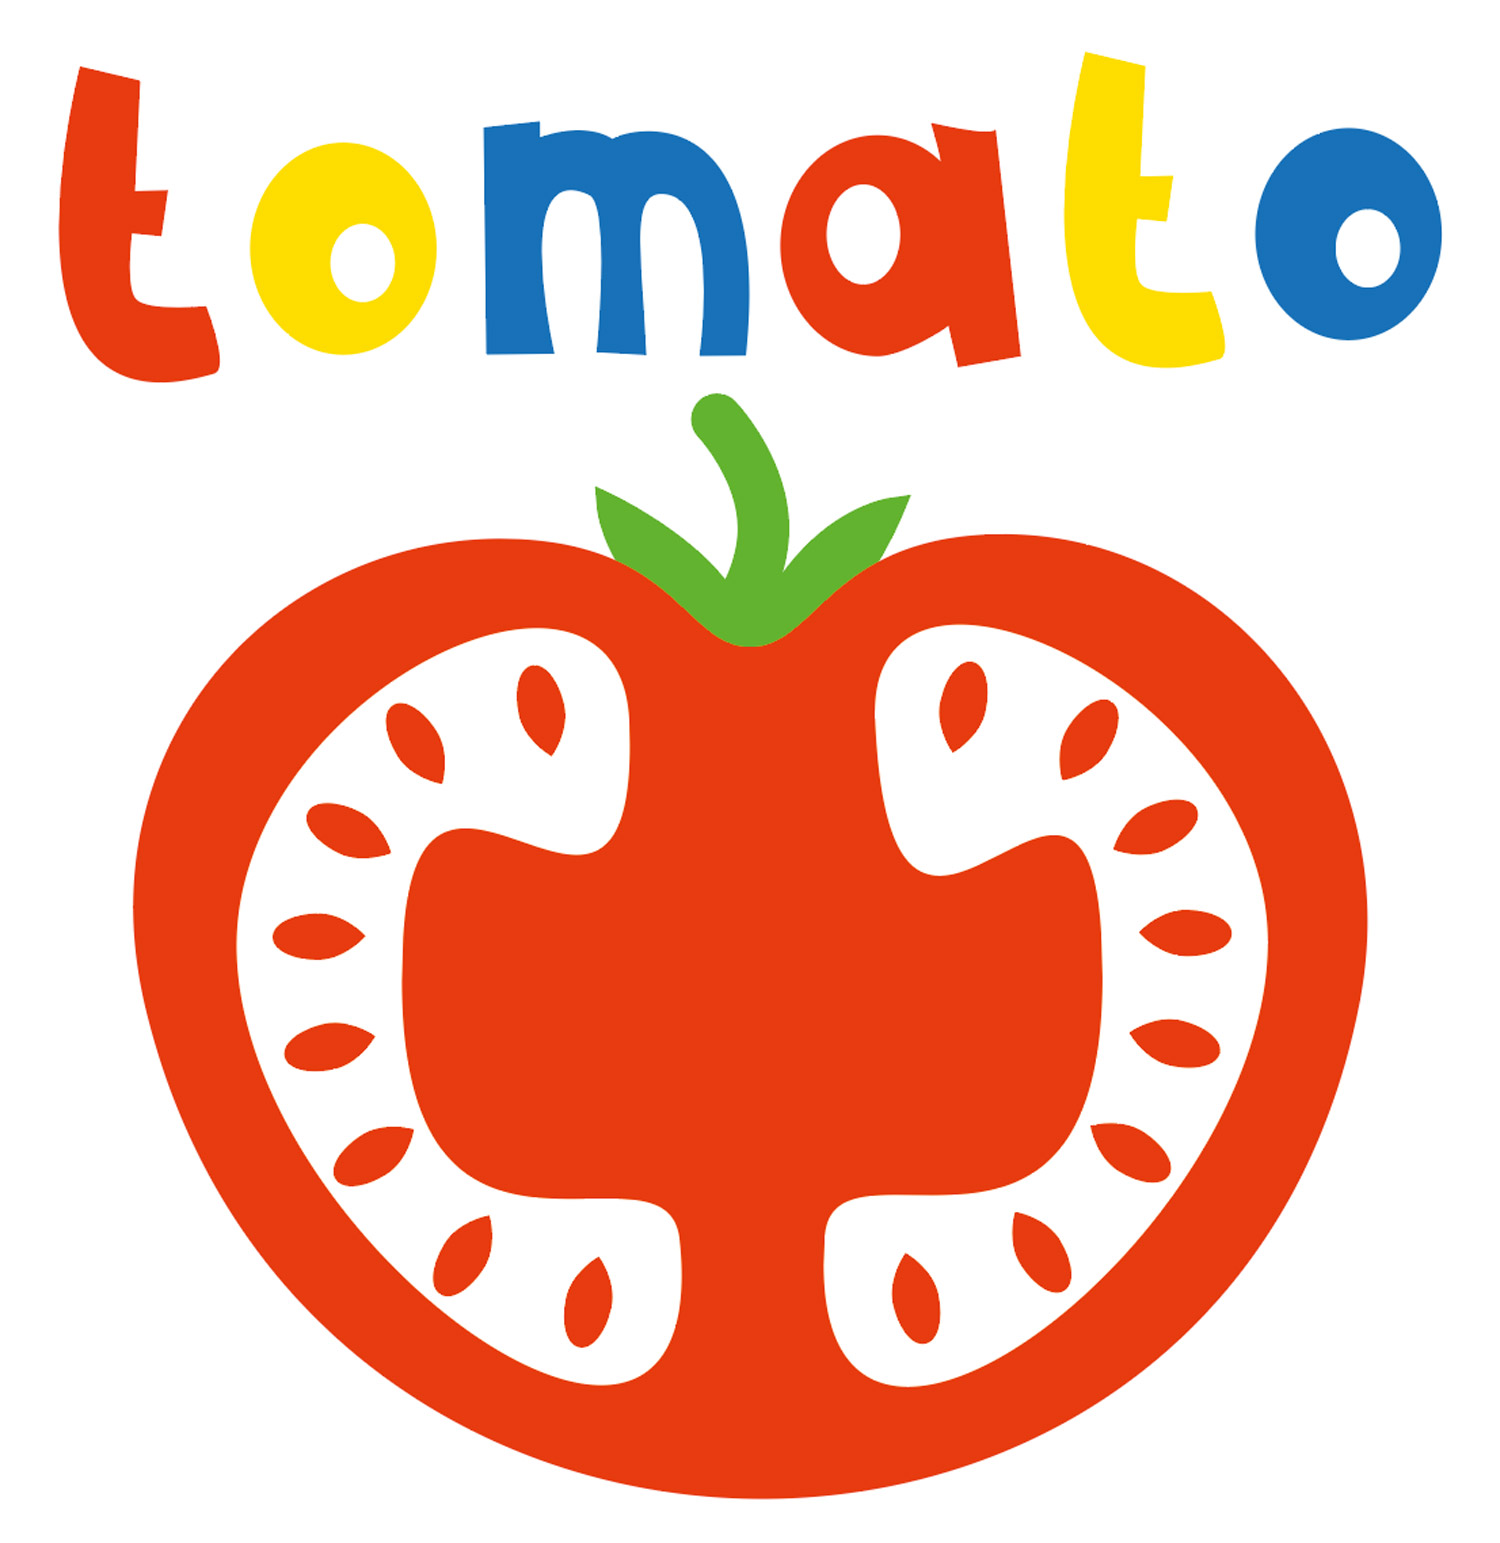 tomato-illustration-poppkins.jpg